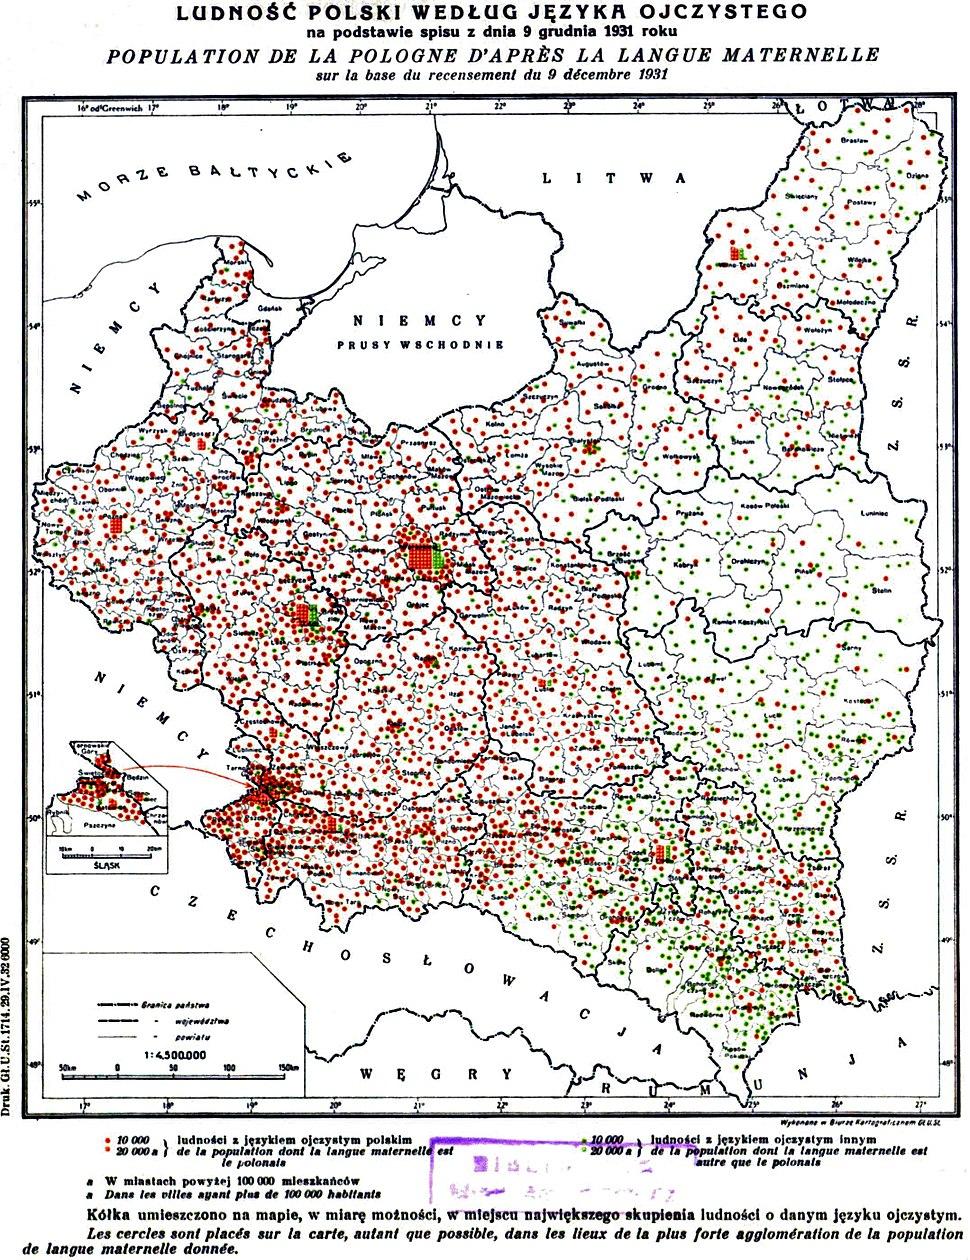 GUS languages1931 Poland